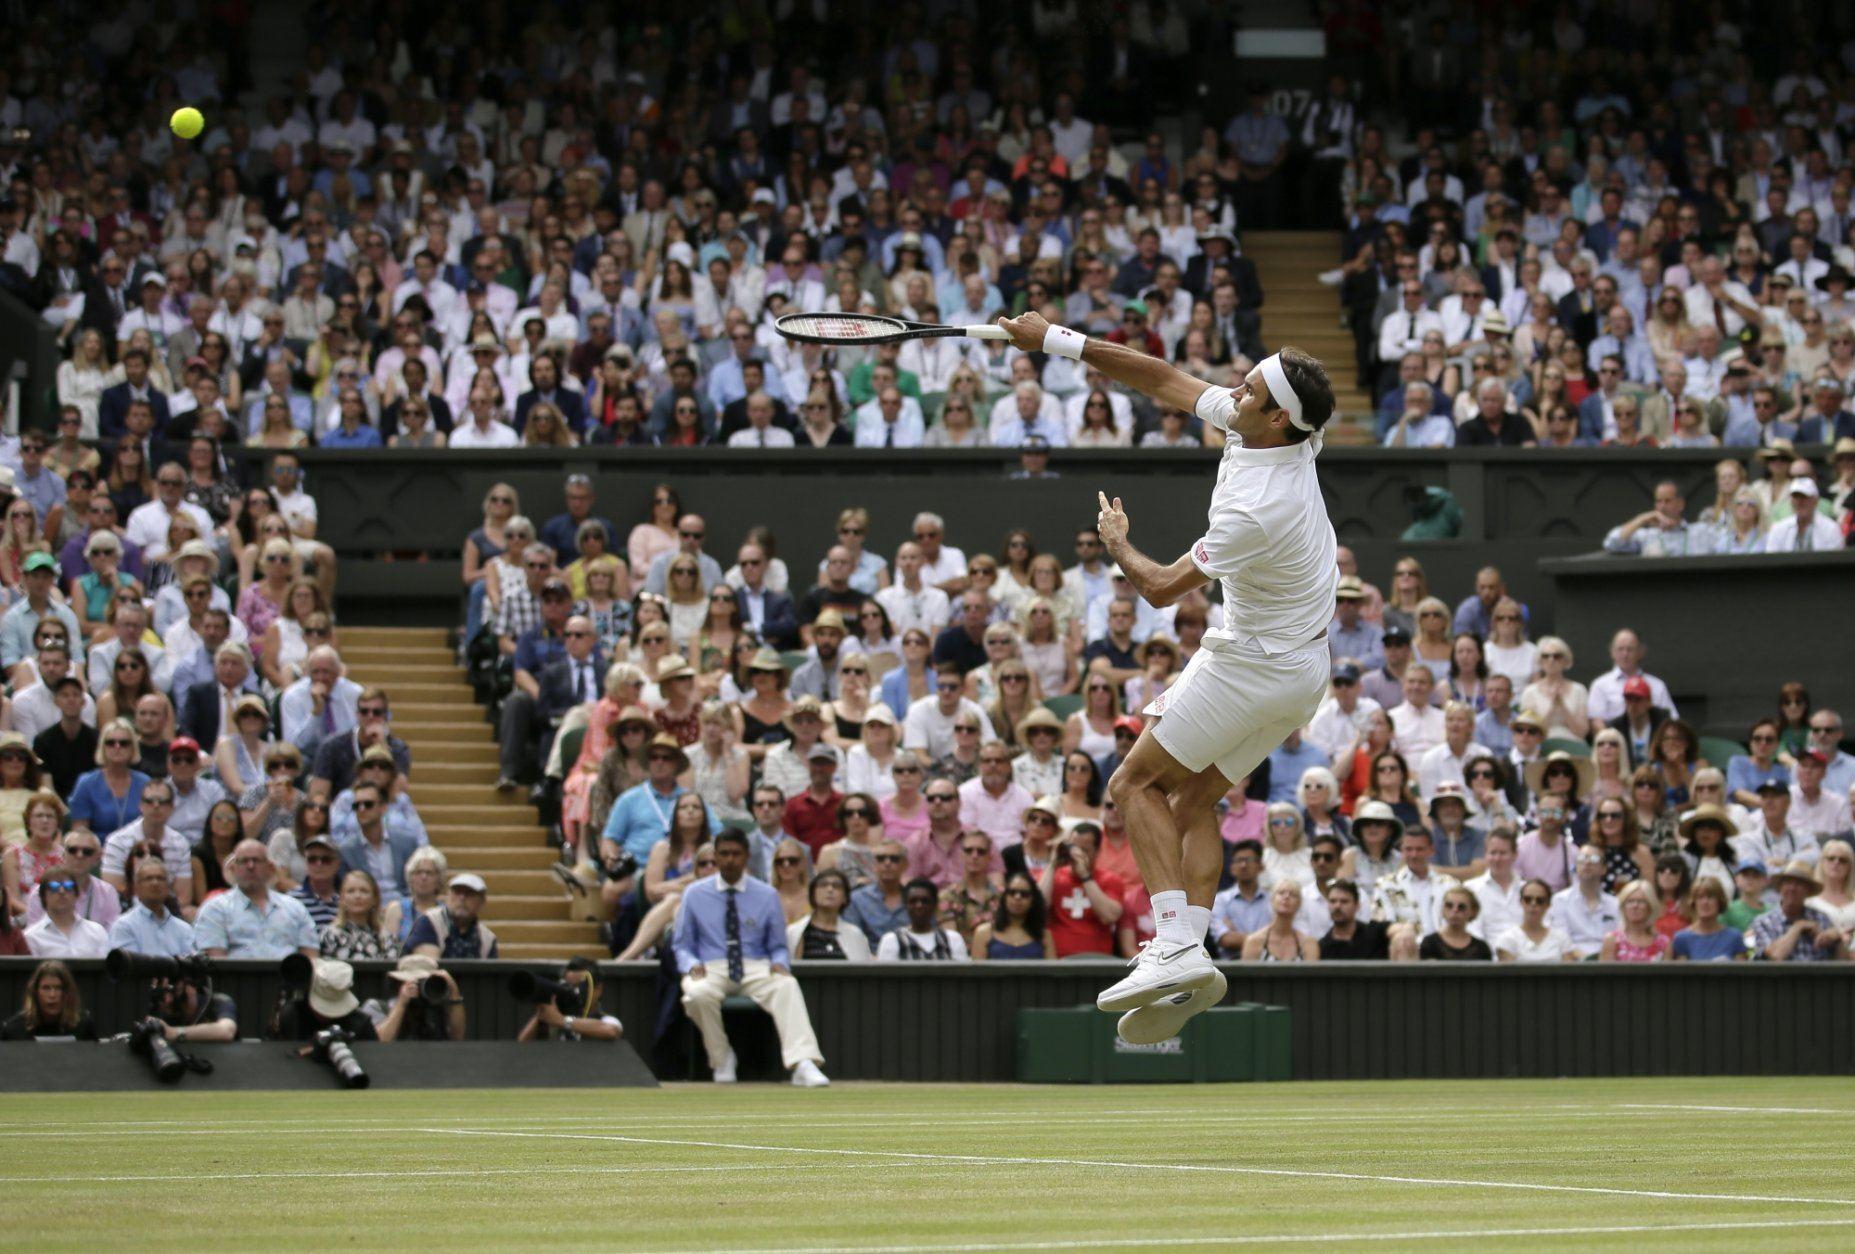 Switzerland's Roger Federer returns the ball to Serbia's Novak Djokovic during the men's singles final match of the Wimbledon Tennis Championships in London, Sunday, July 14, 2019. (AP Photo/Tim Ireland)